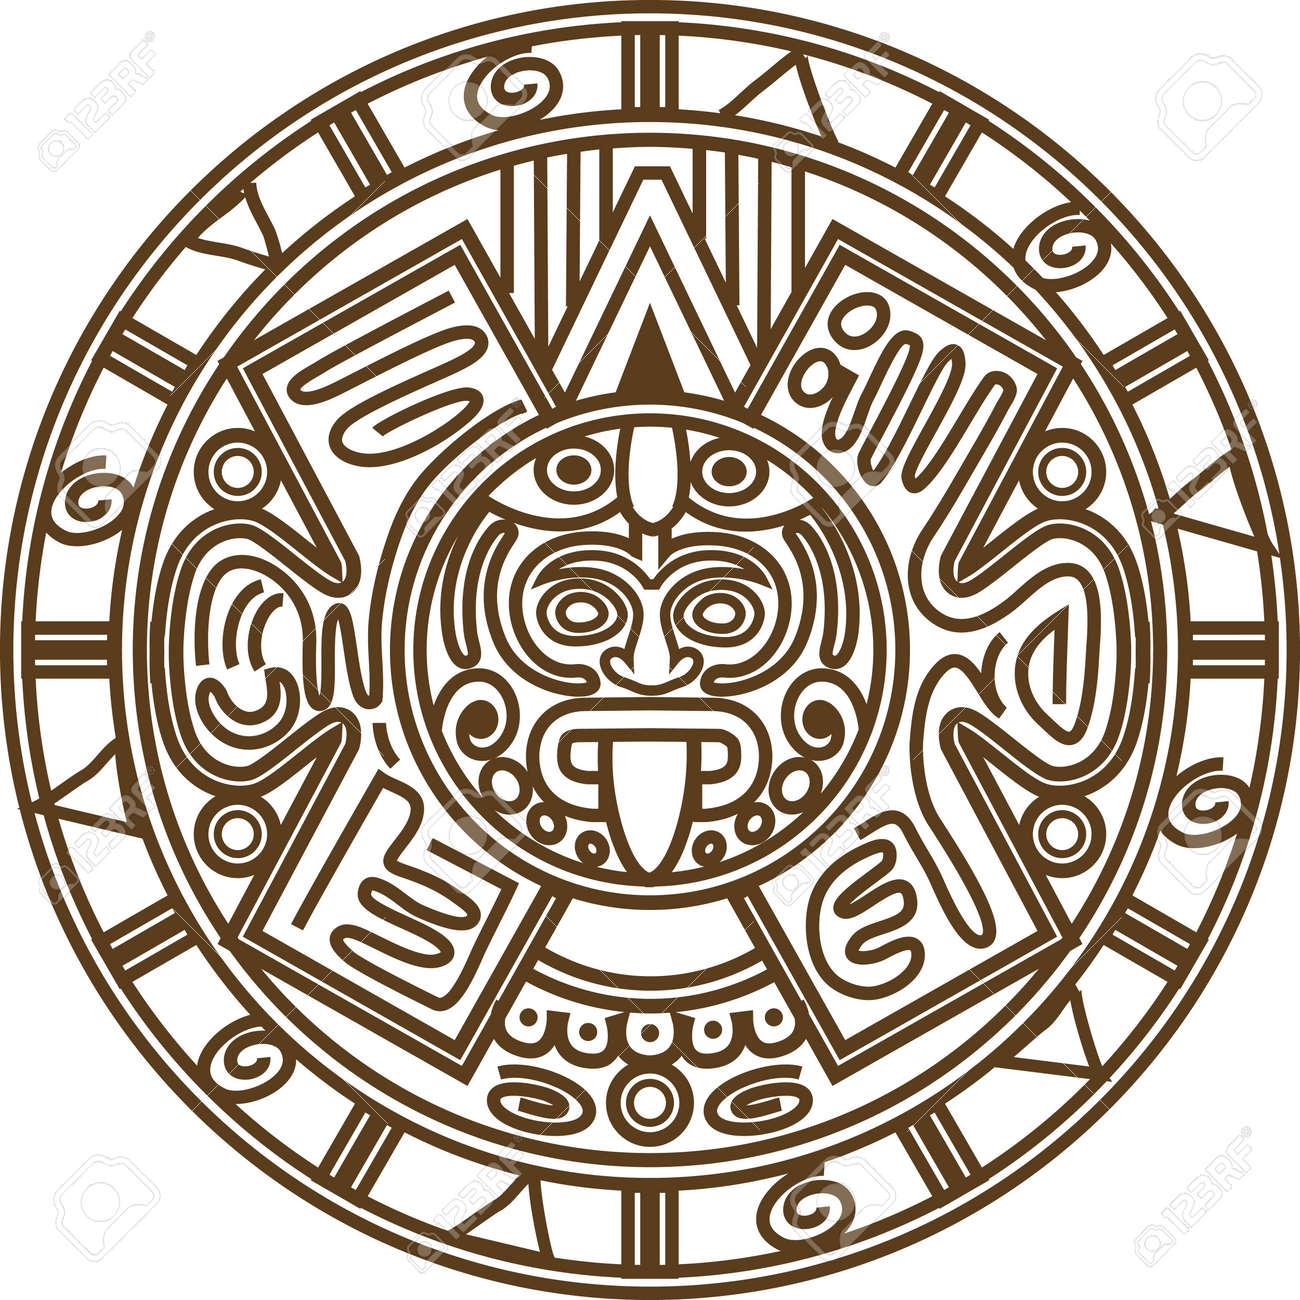 Calendrier Maya Signe.Vector Illustration Image Stylisee De L Ancien Calendrier Maya